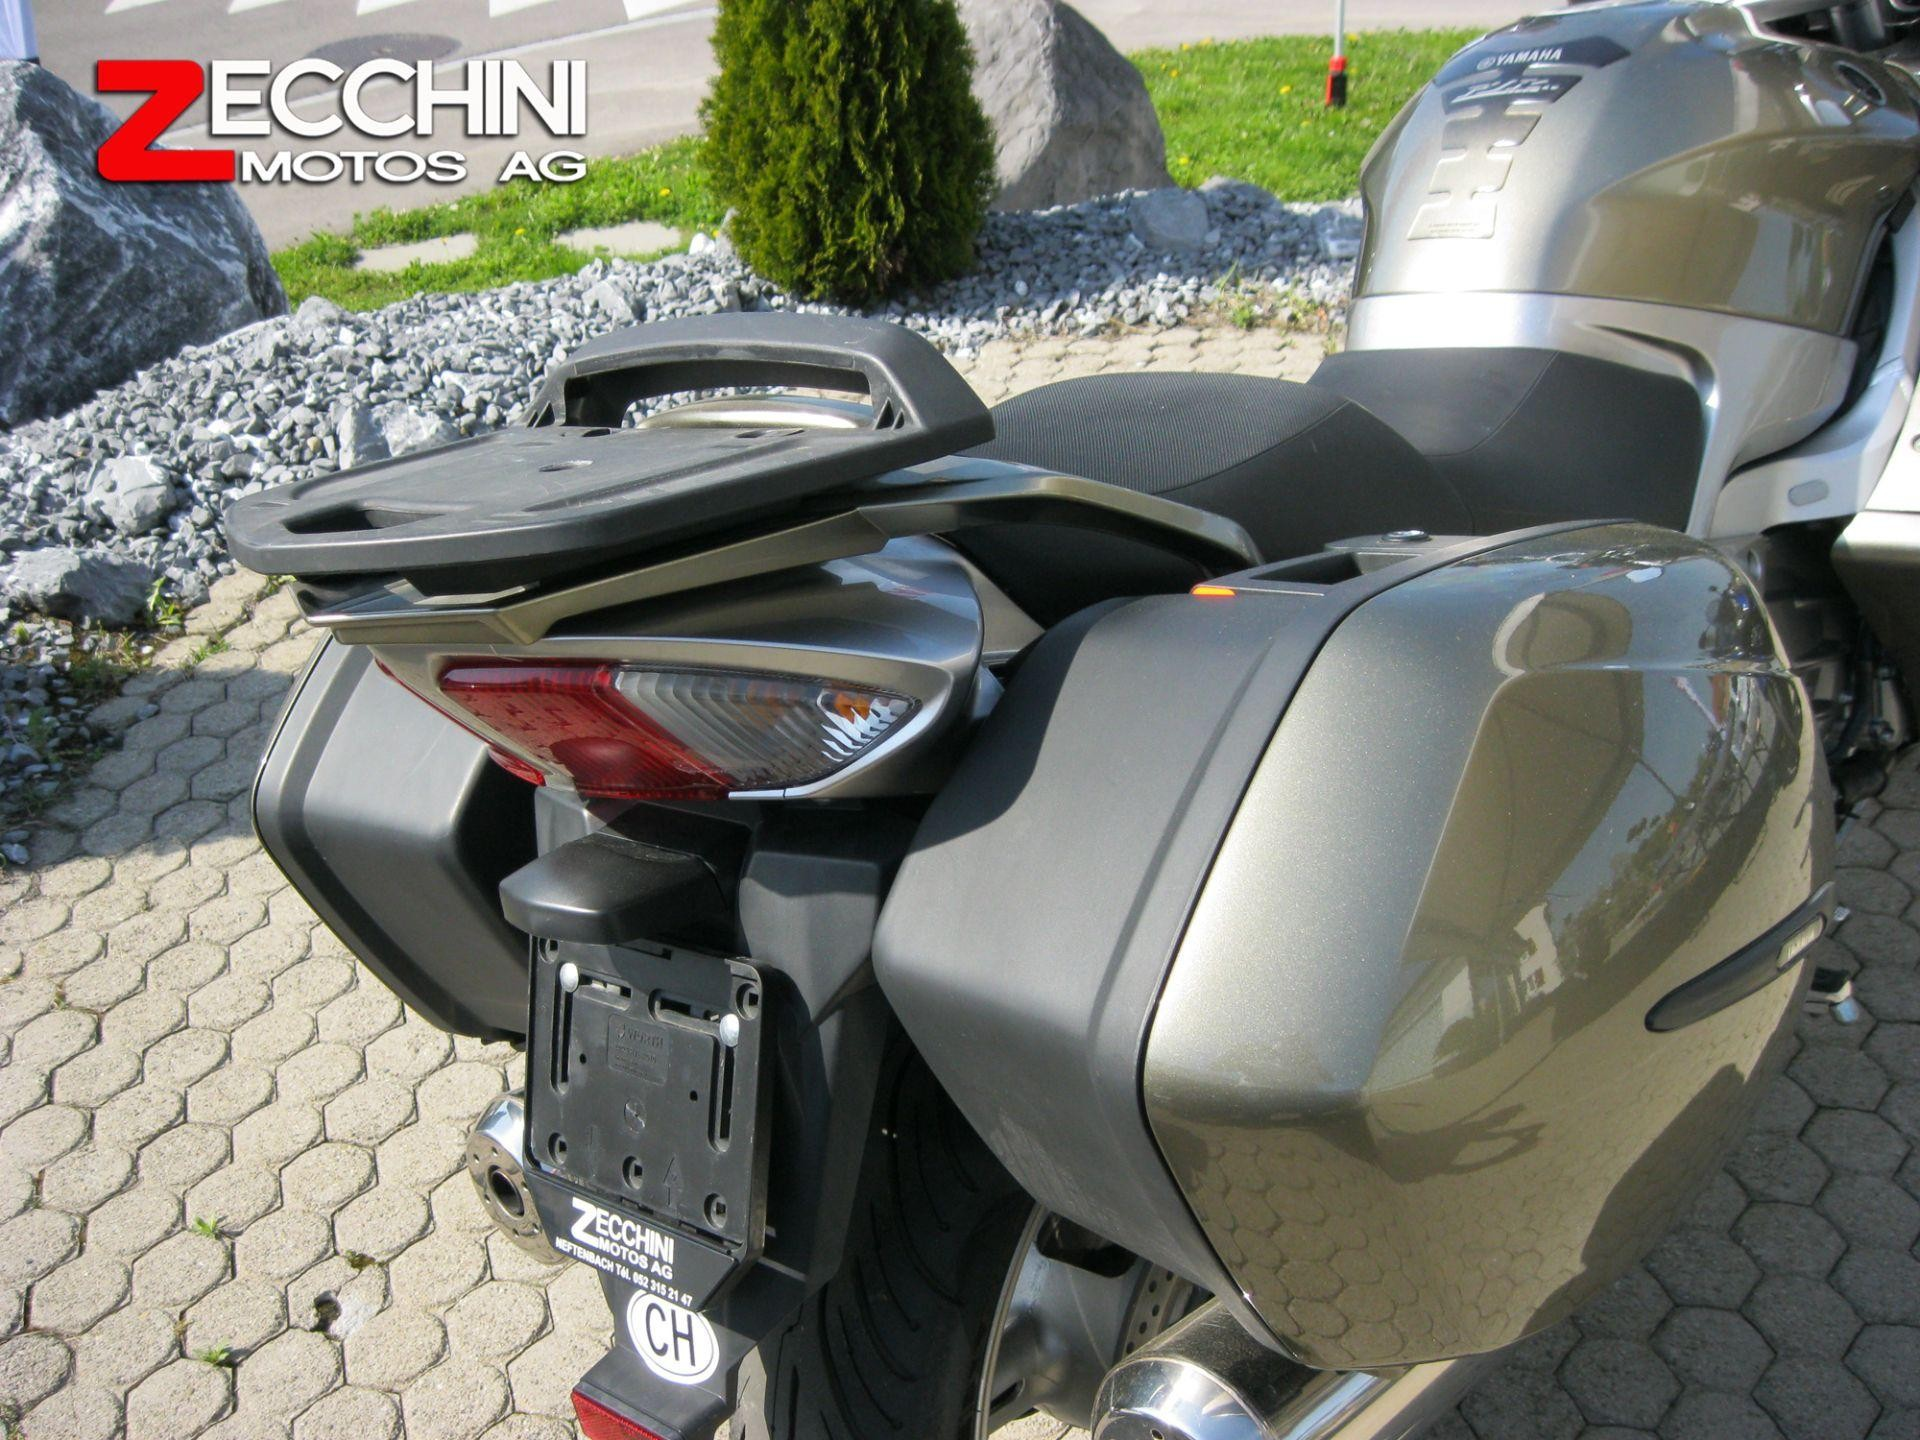 motorrad occasion kaufen yamaha fjr 1300 abs zecchini motos ag neftenbach. Black Bedroom Furniture Sets. Home Design Ideas